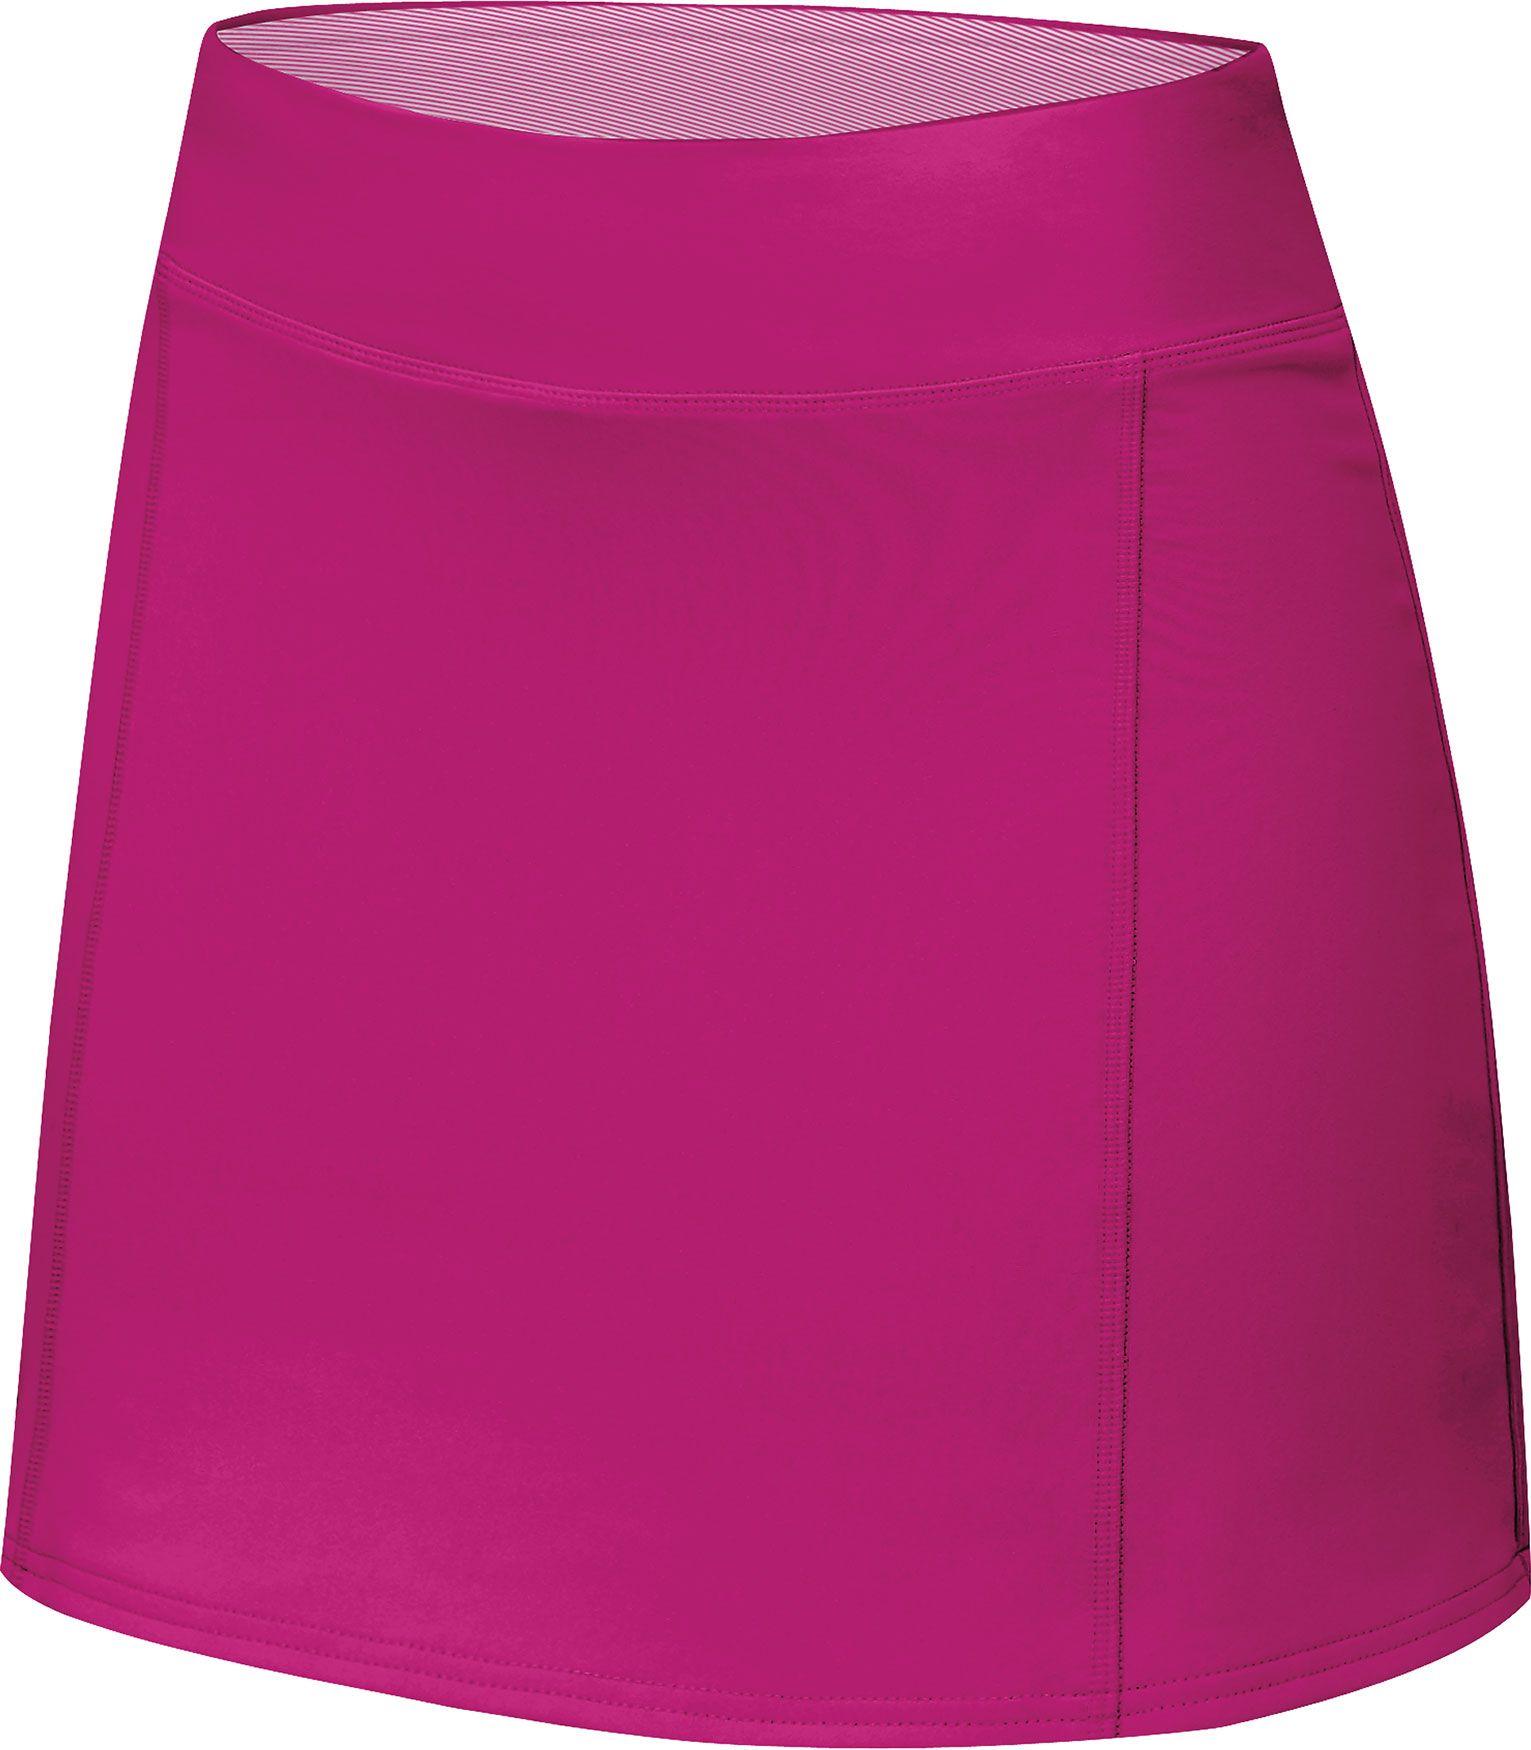 adidas Girls Rangewear Golf Skort DICKS Sporting Goods